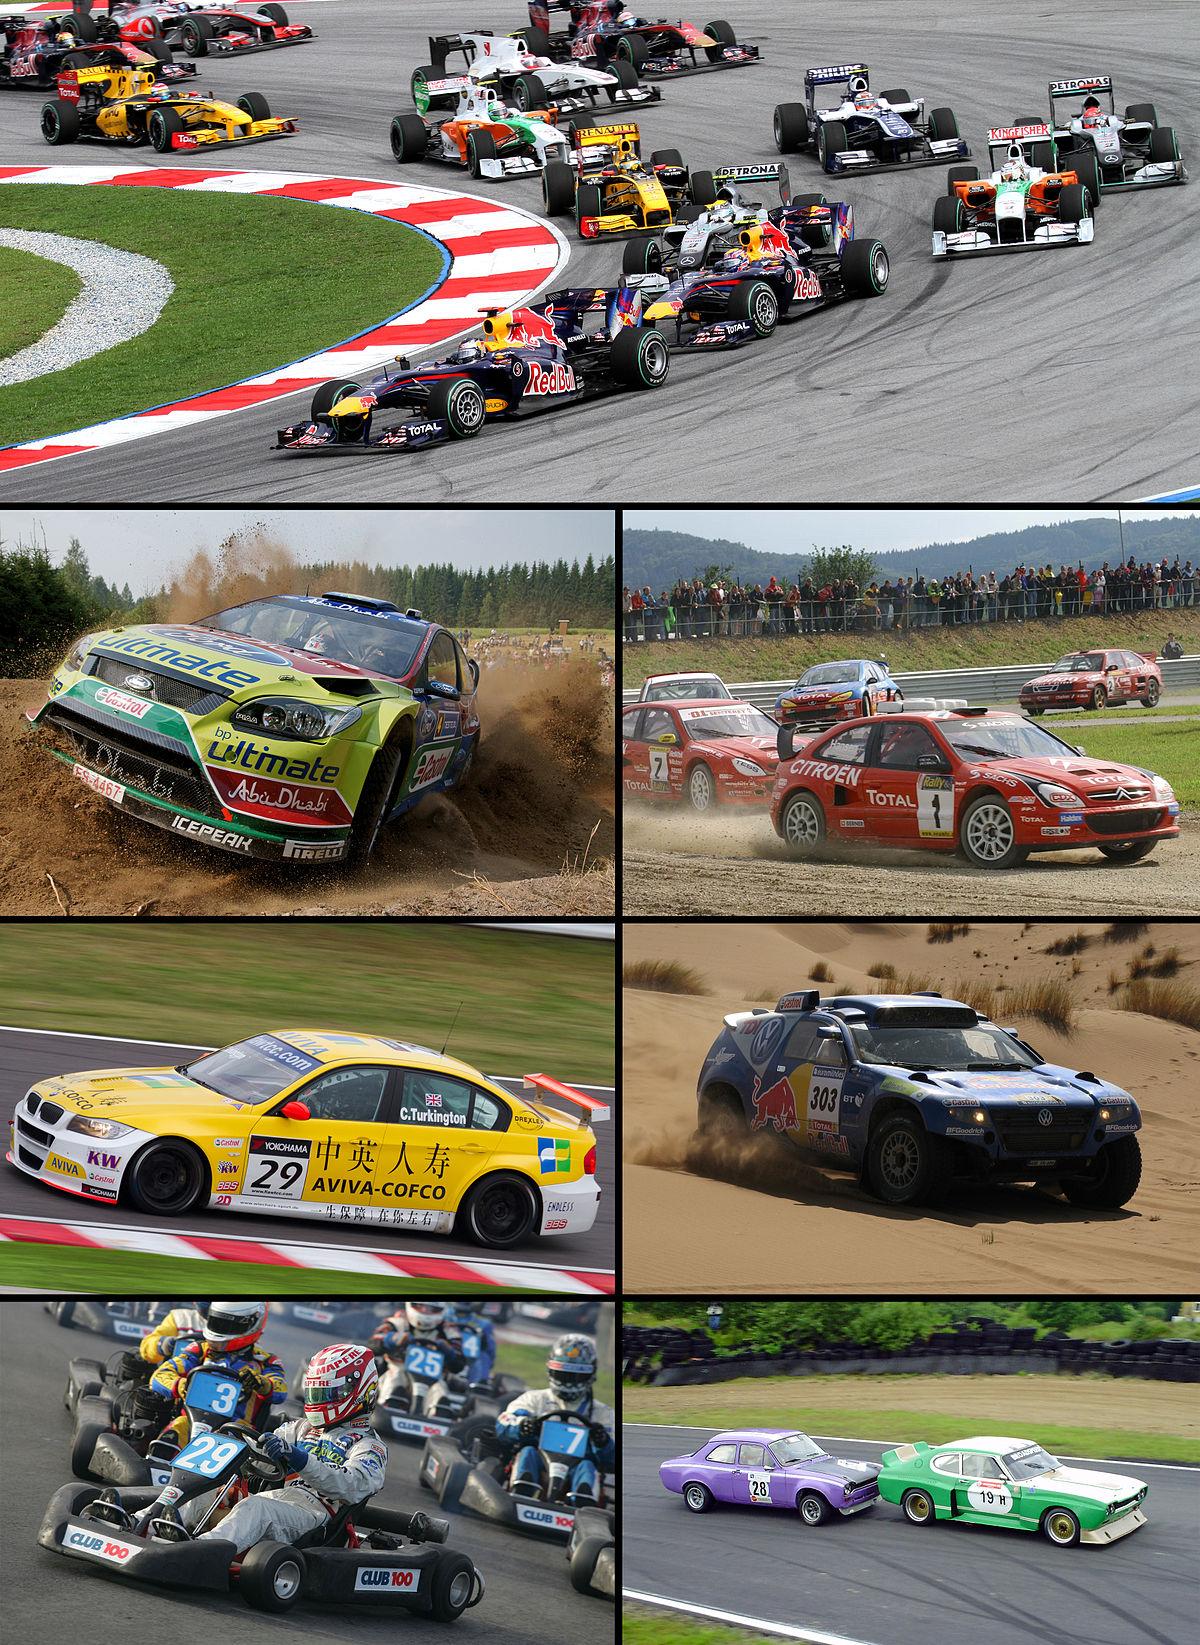 Sport automobile, circuit fermé, rallye et karting